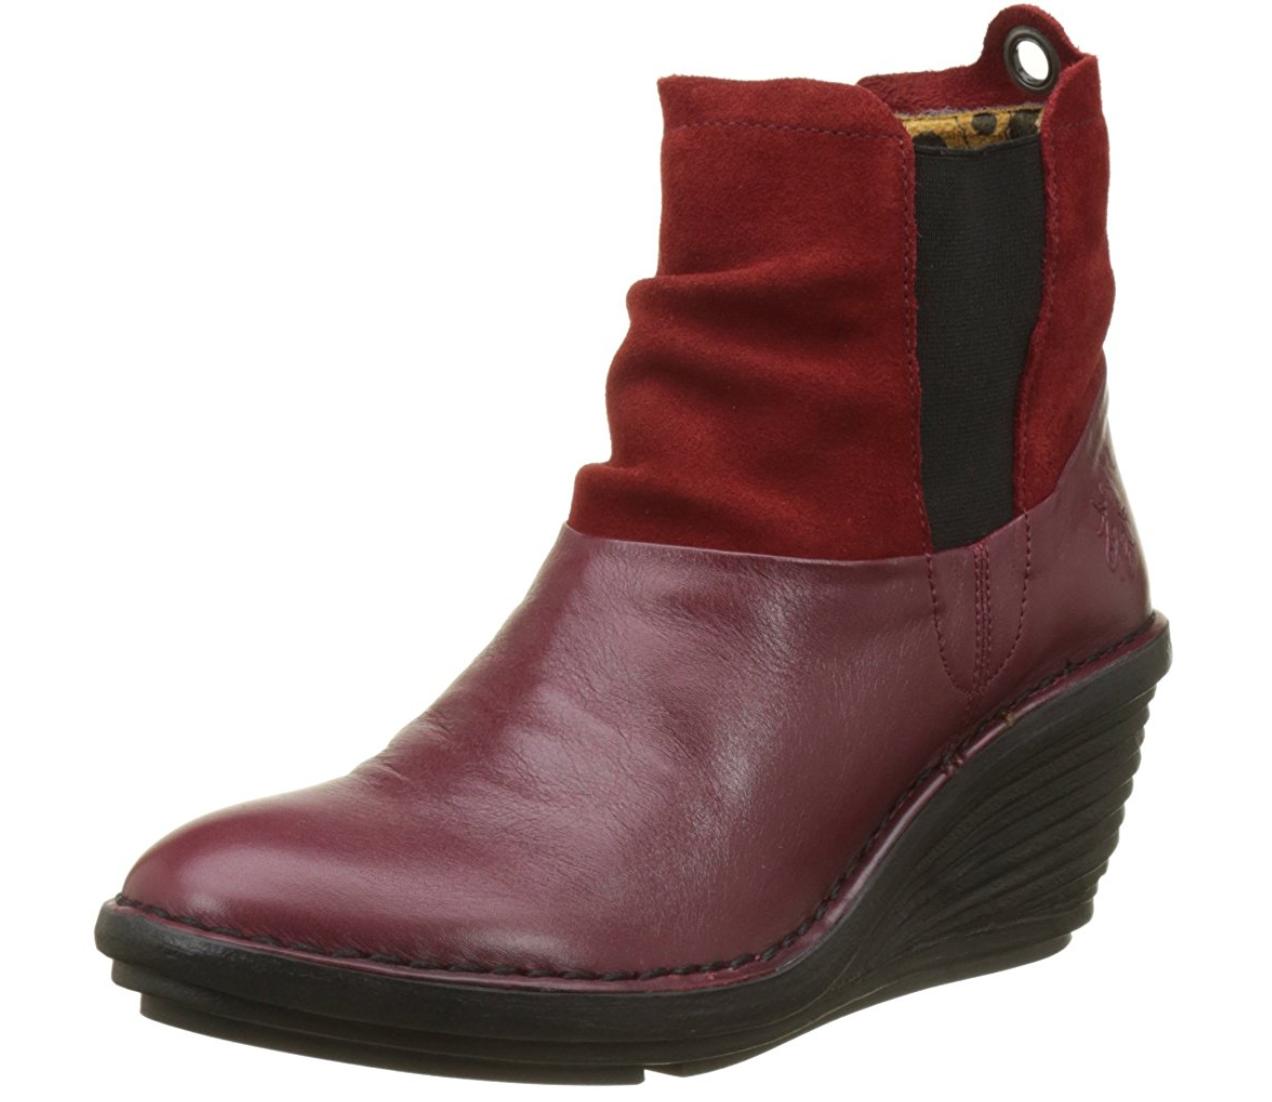 Fly London SULA  Cordoba RED Womens Boots Heel Wedge US 11-11.5 EU 42